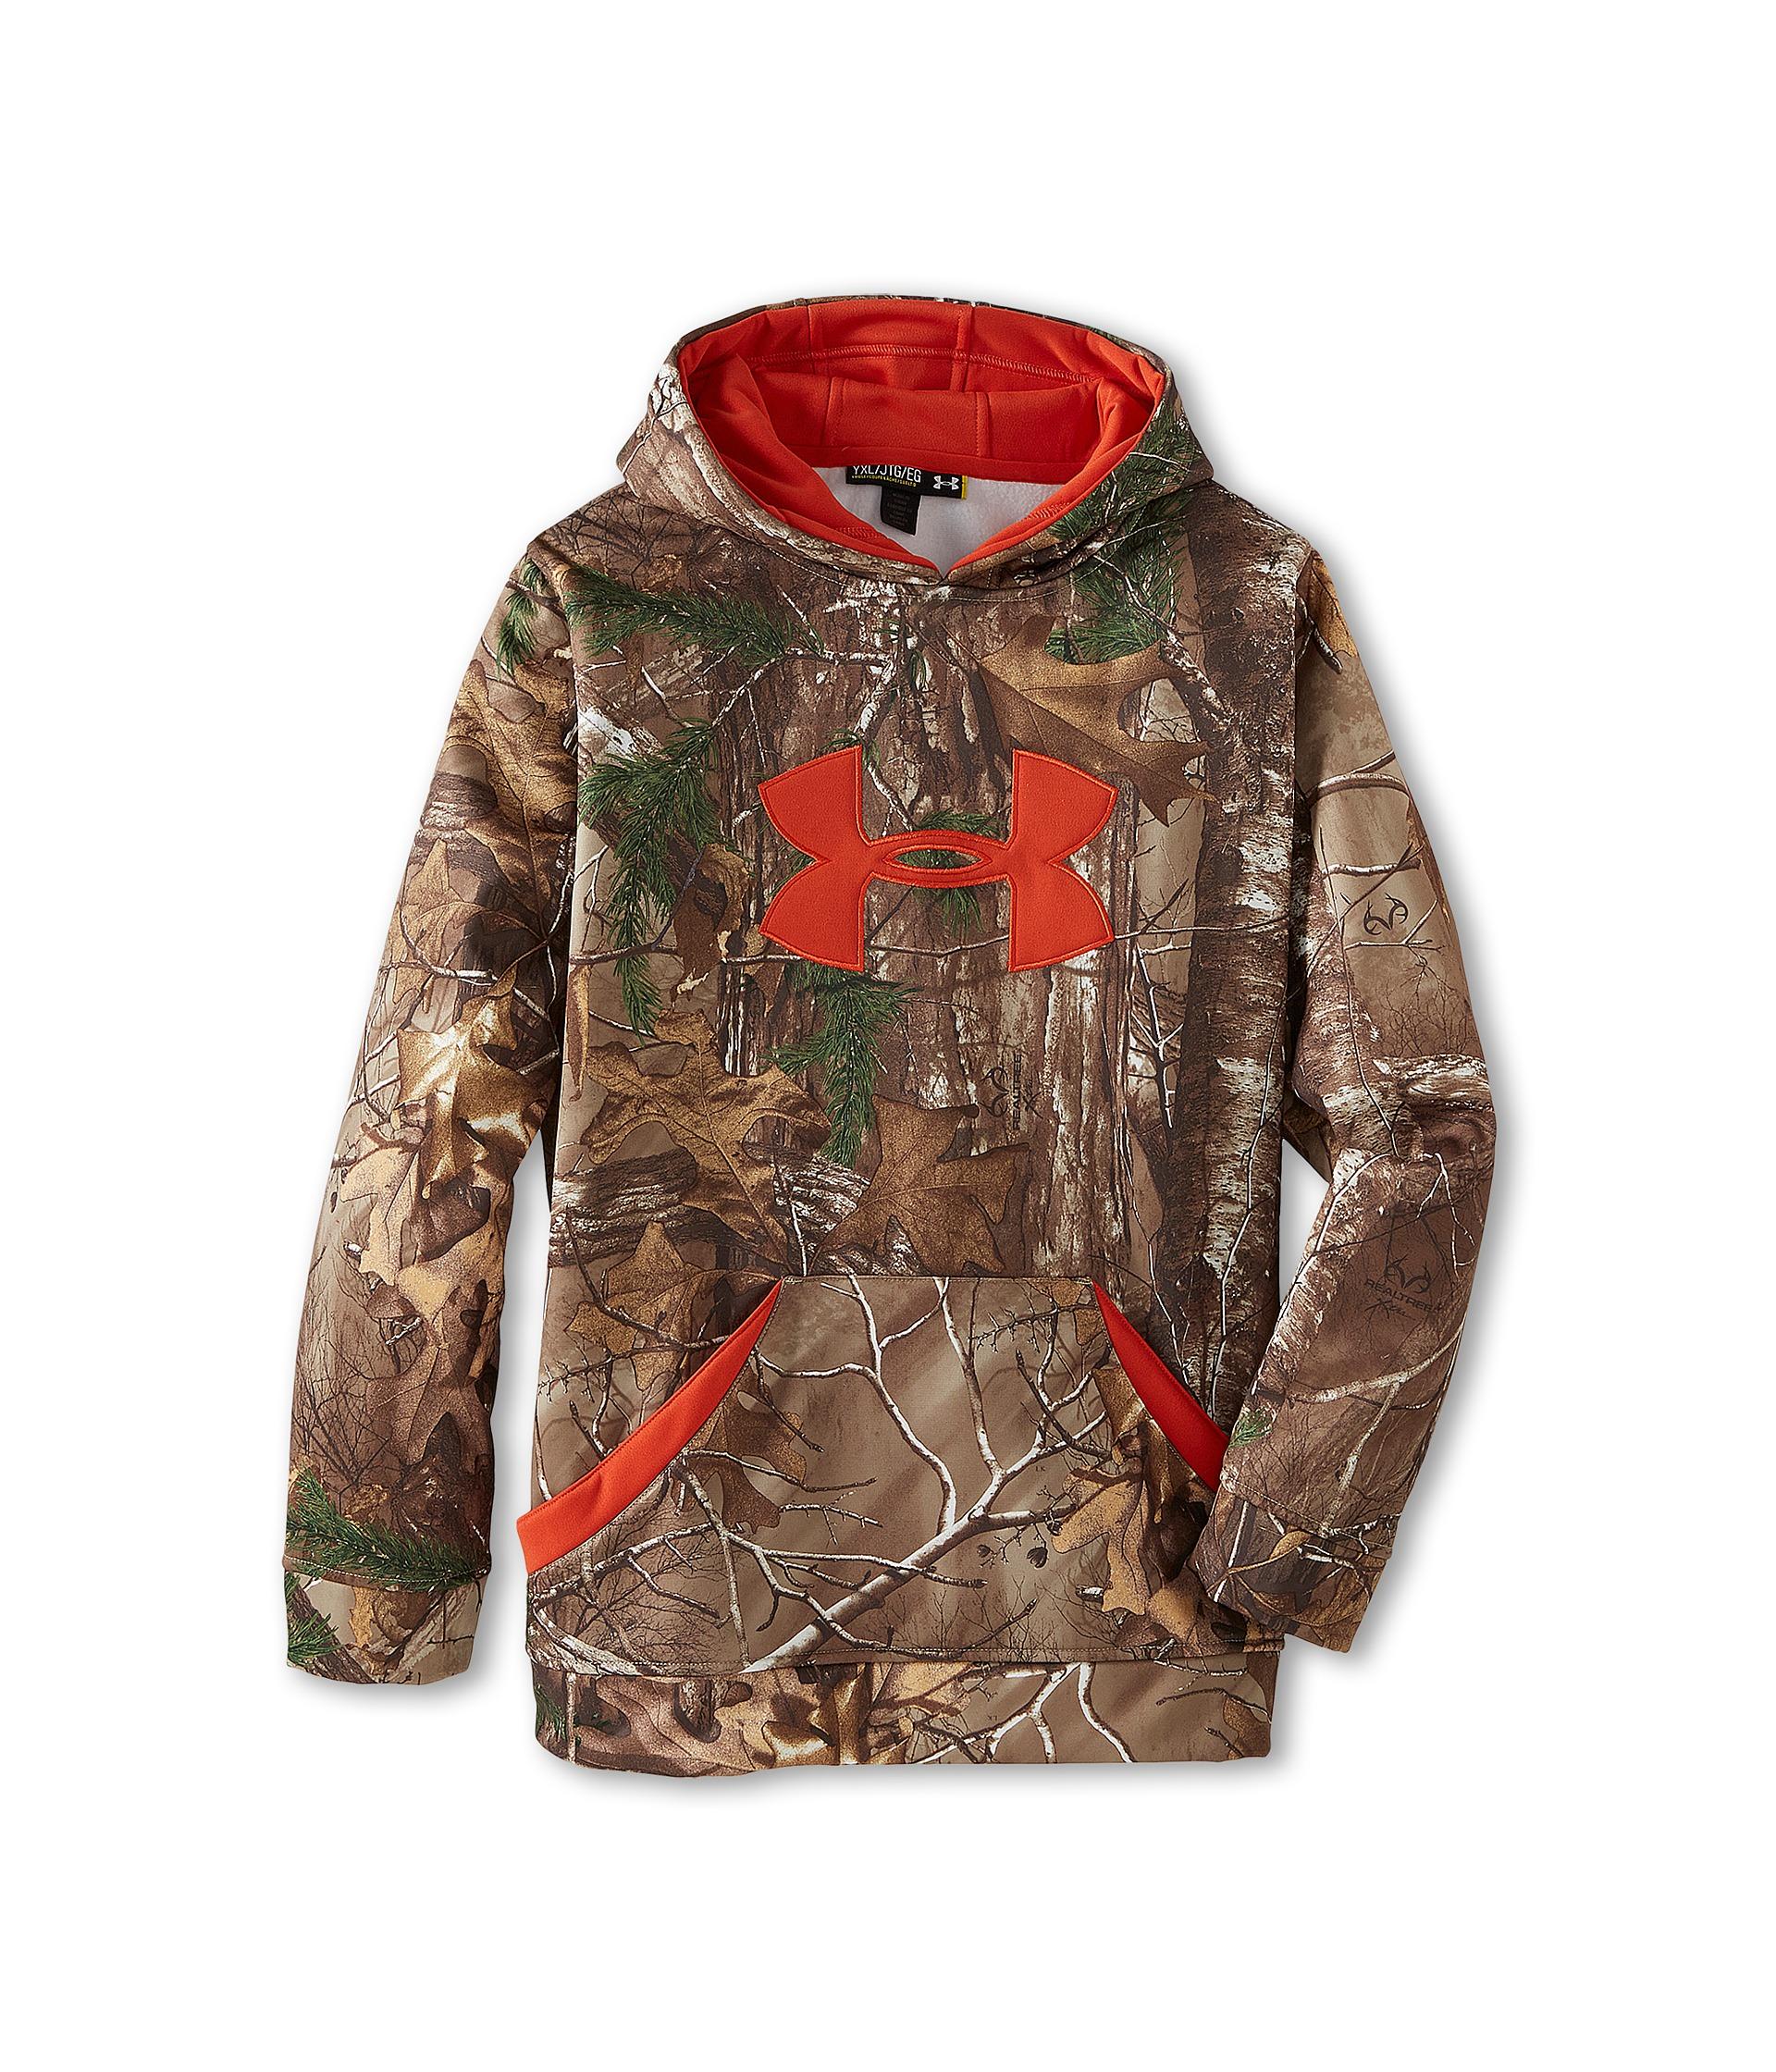 Camo hoodie under armour